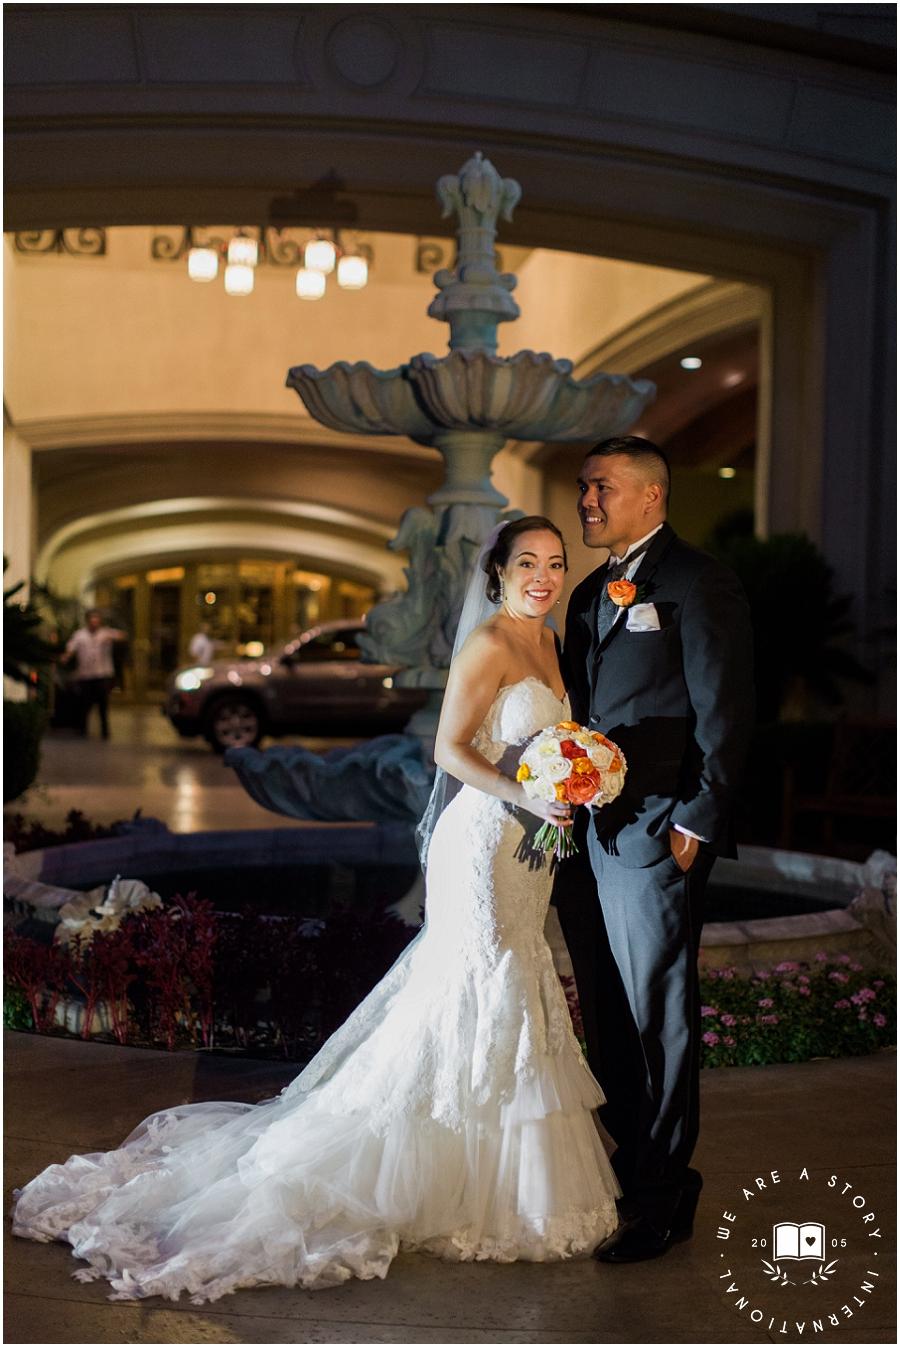 Four Seasons wedding photographer Las Vegas _ We Are A Story wedding photographer_2498.jpg